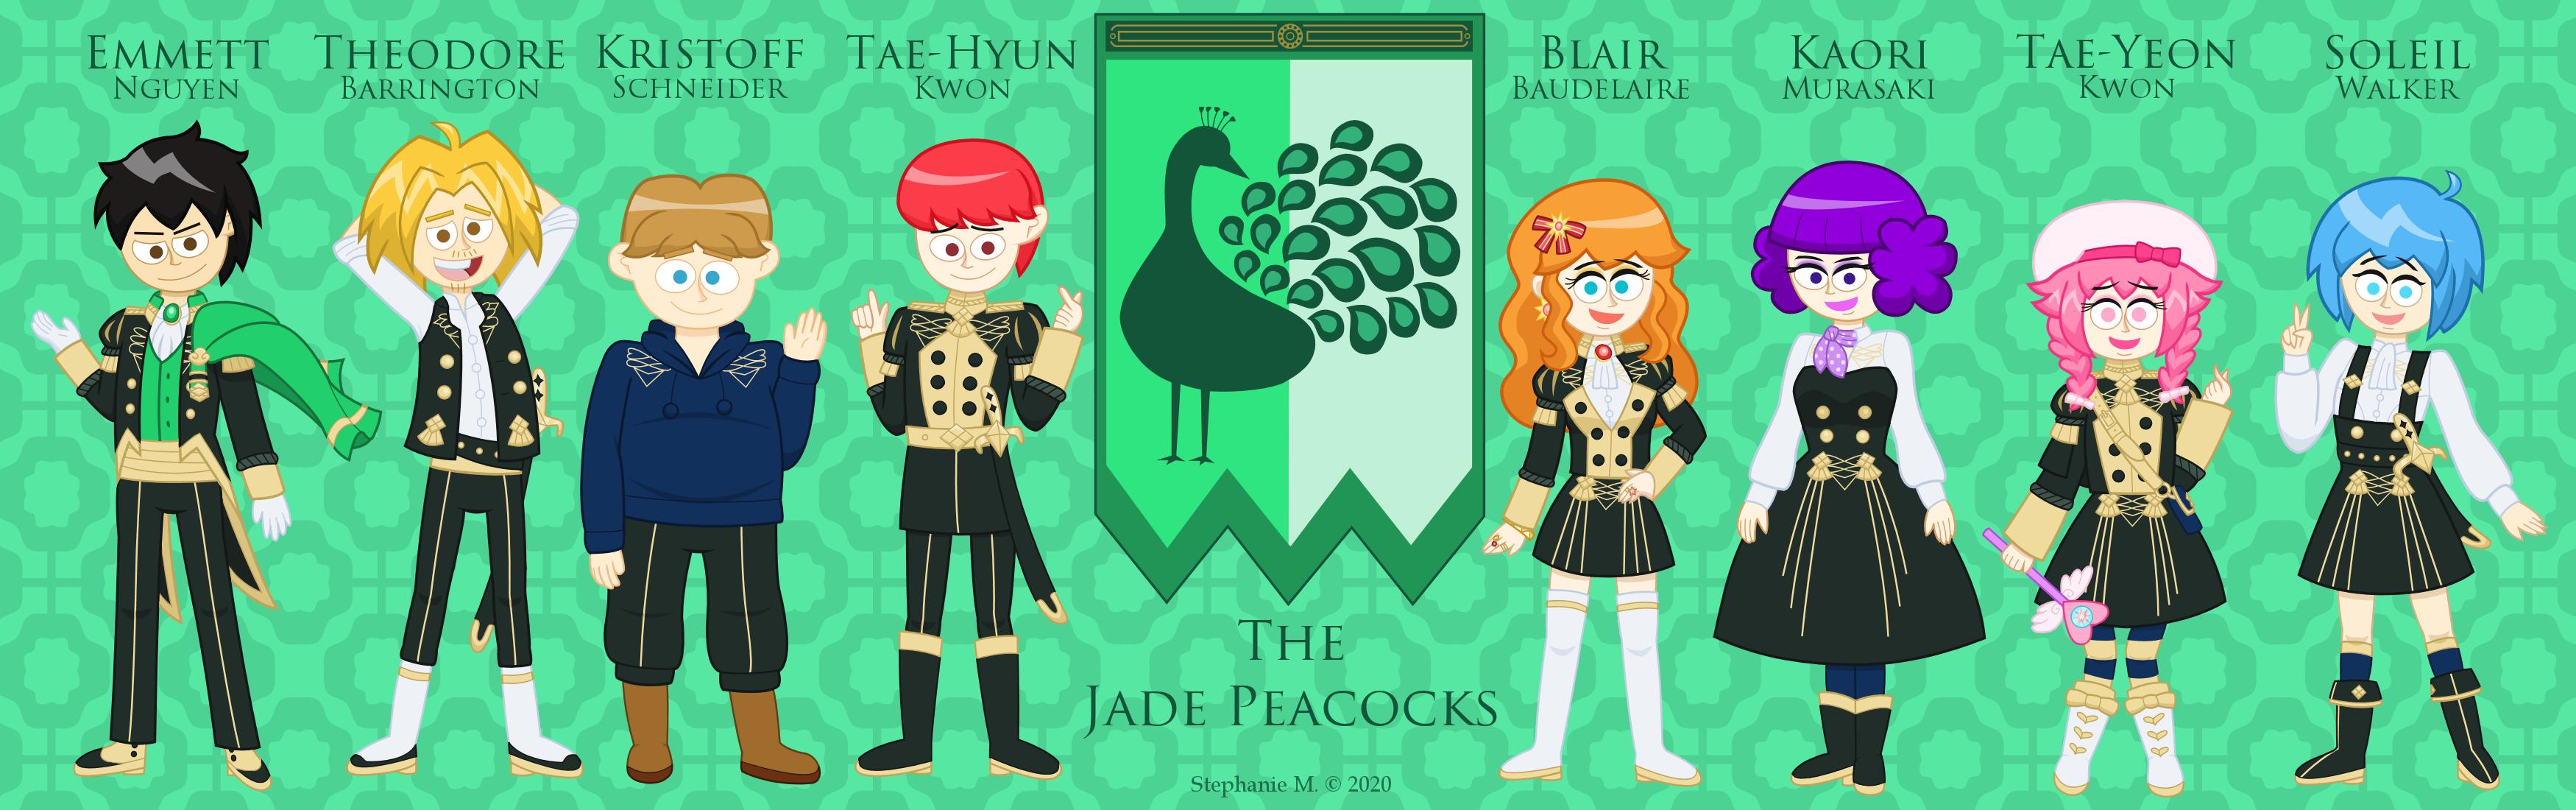 The Jade Peacocks